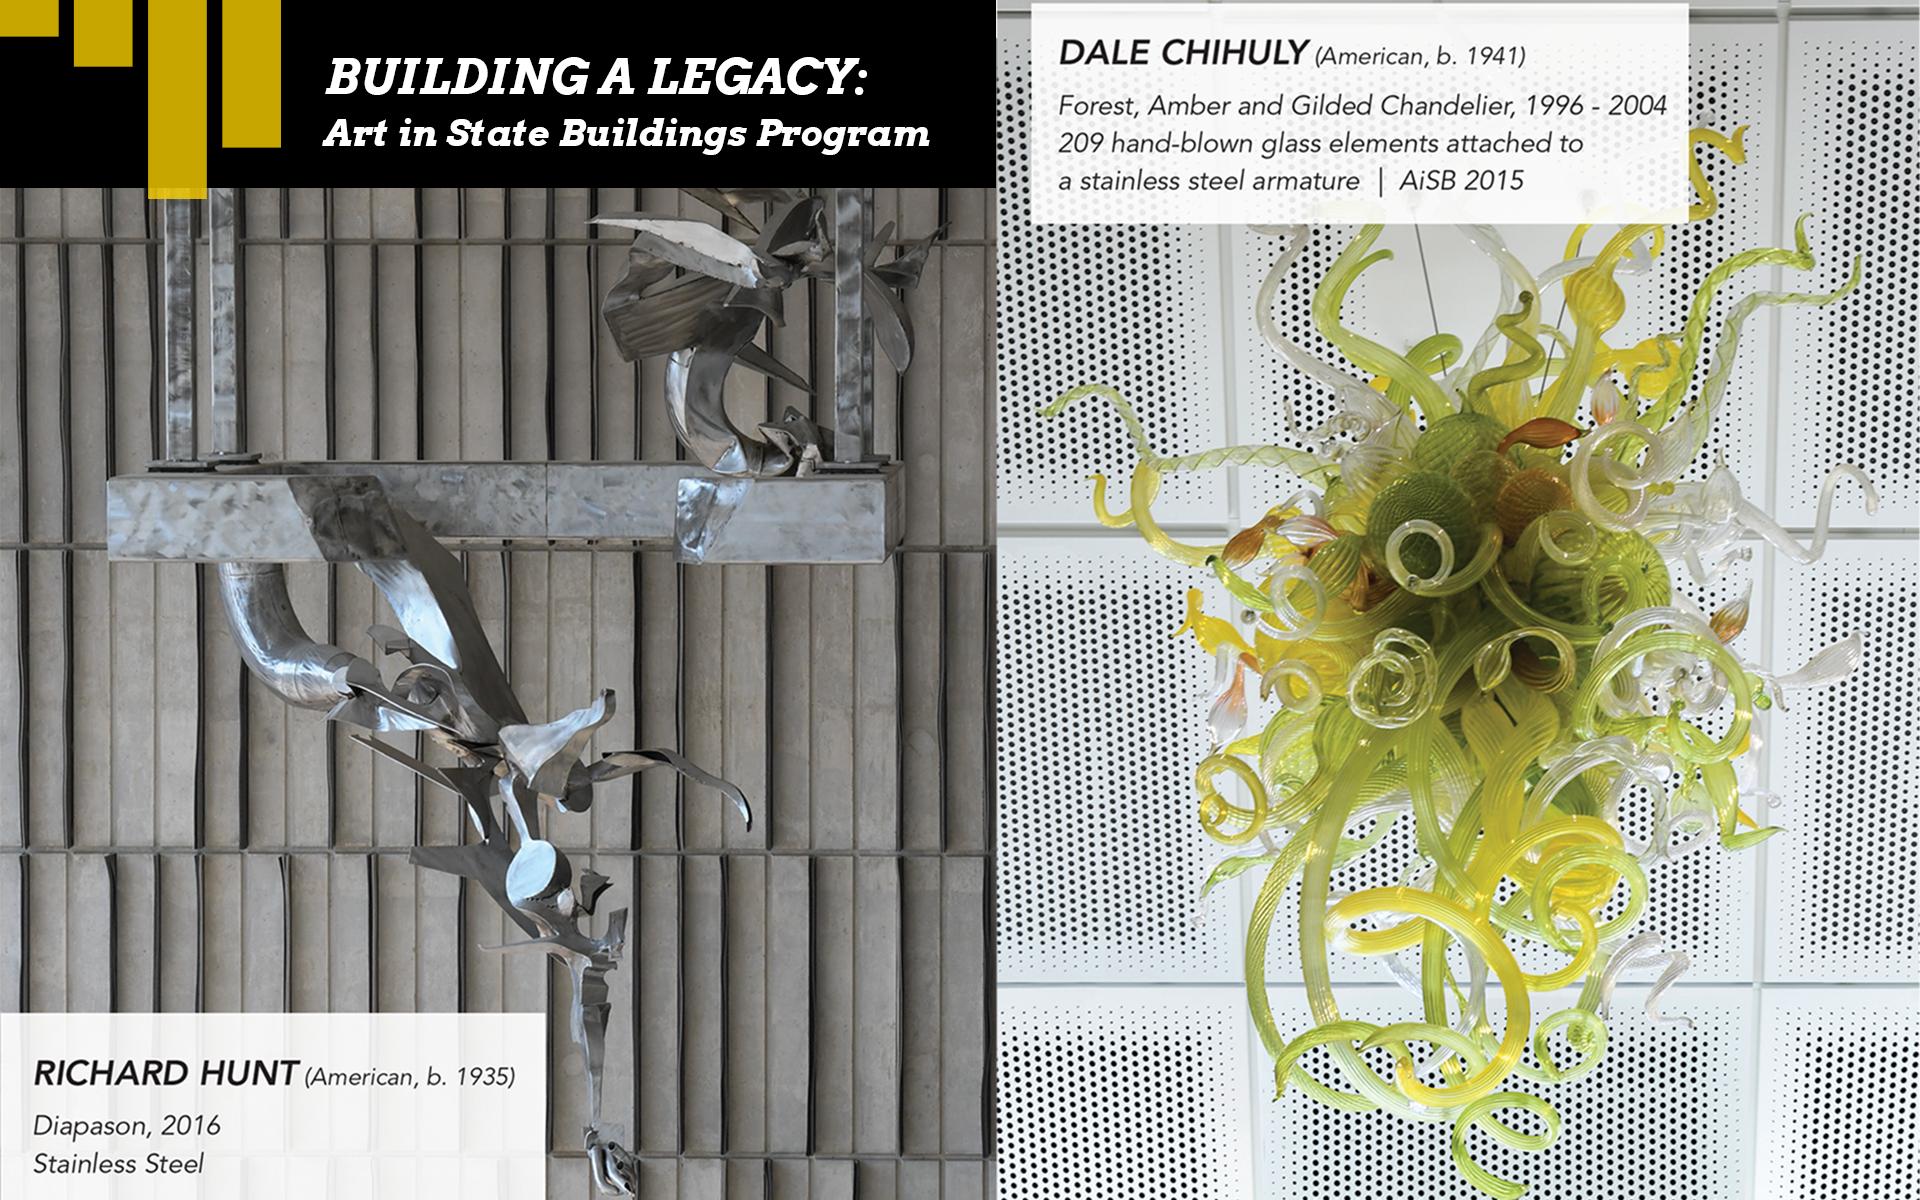 Art in State Buildings Program